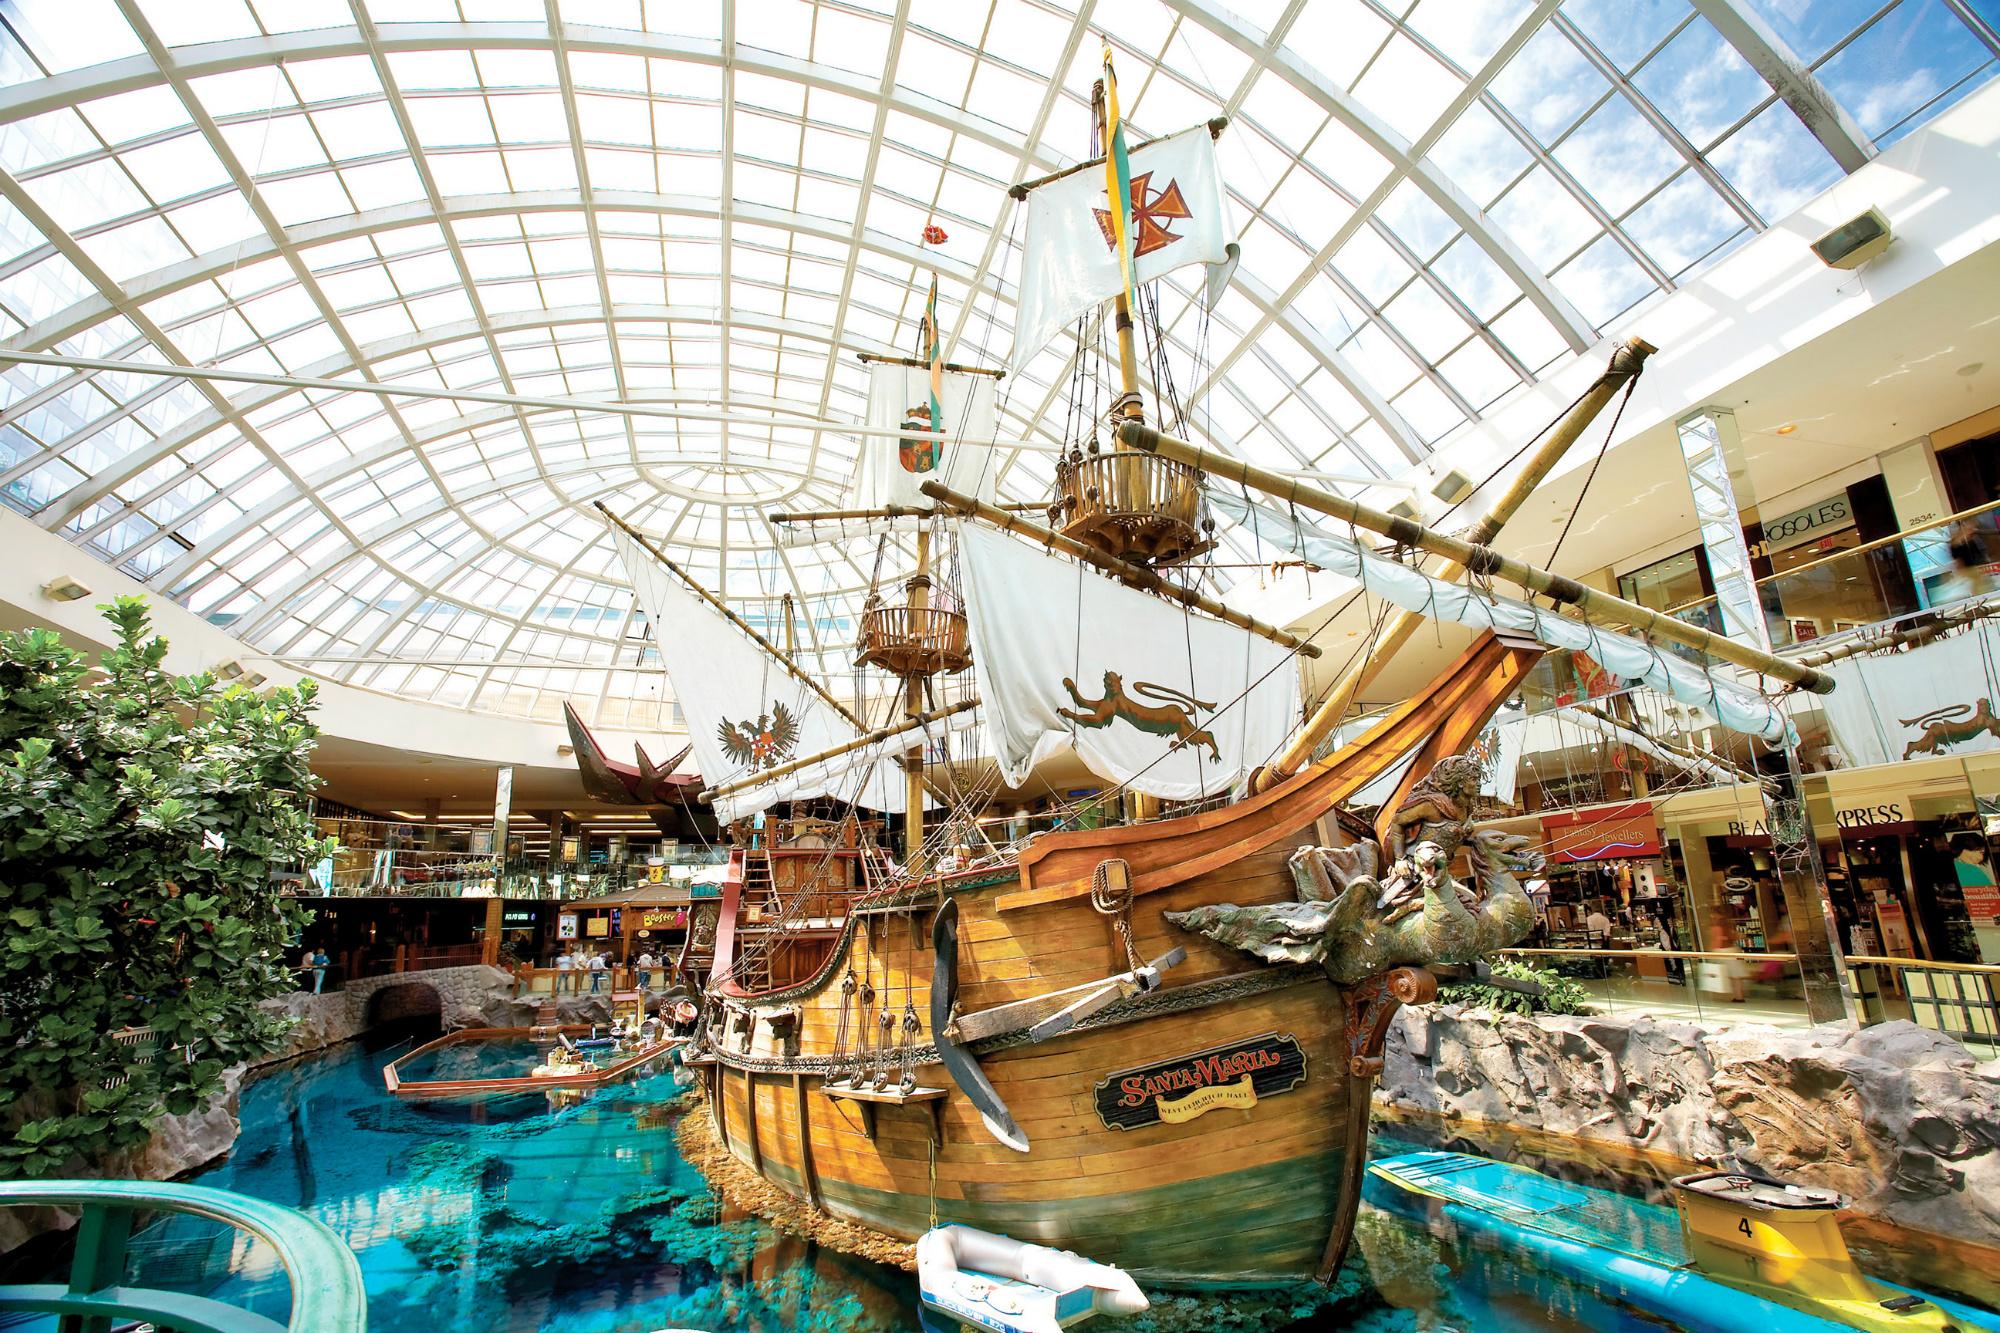 De binnenkant van West Edmonton Mall